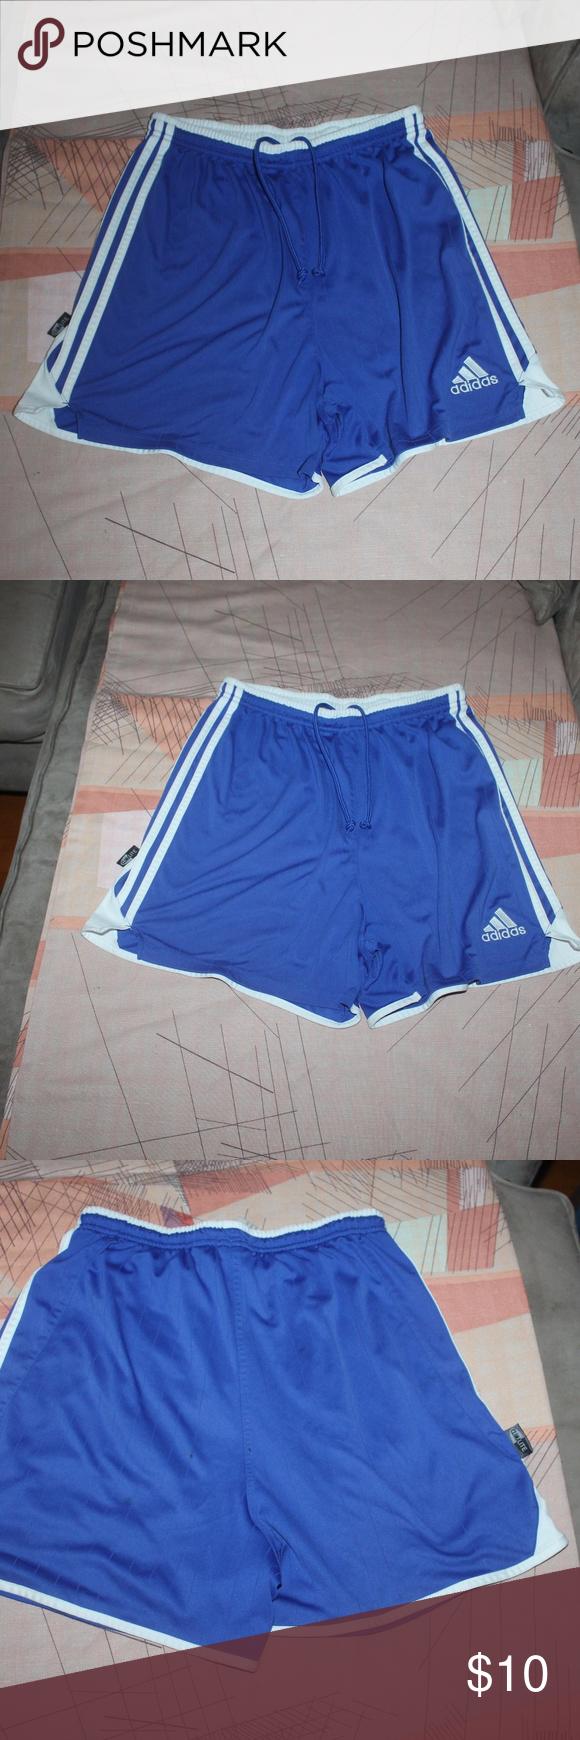 ADIDAS CLIMALITE blue and white striped shorts Adidas